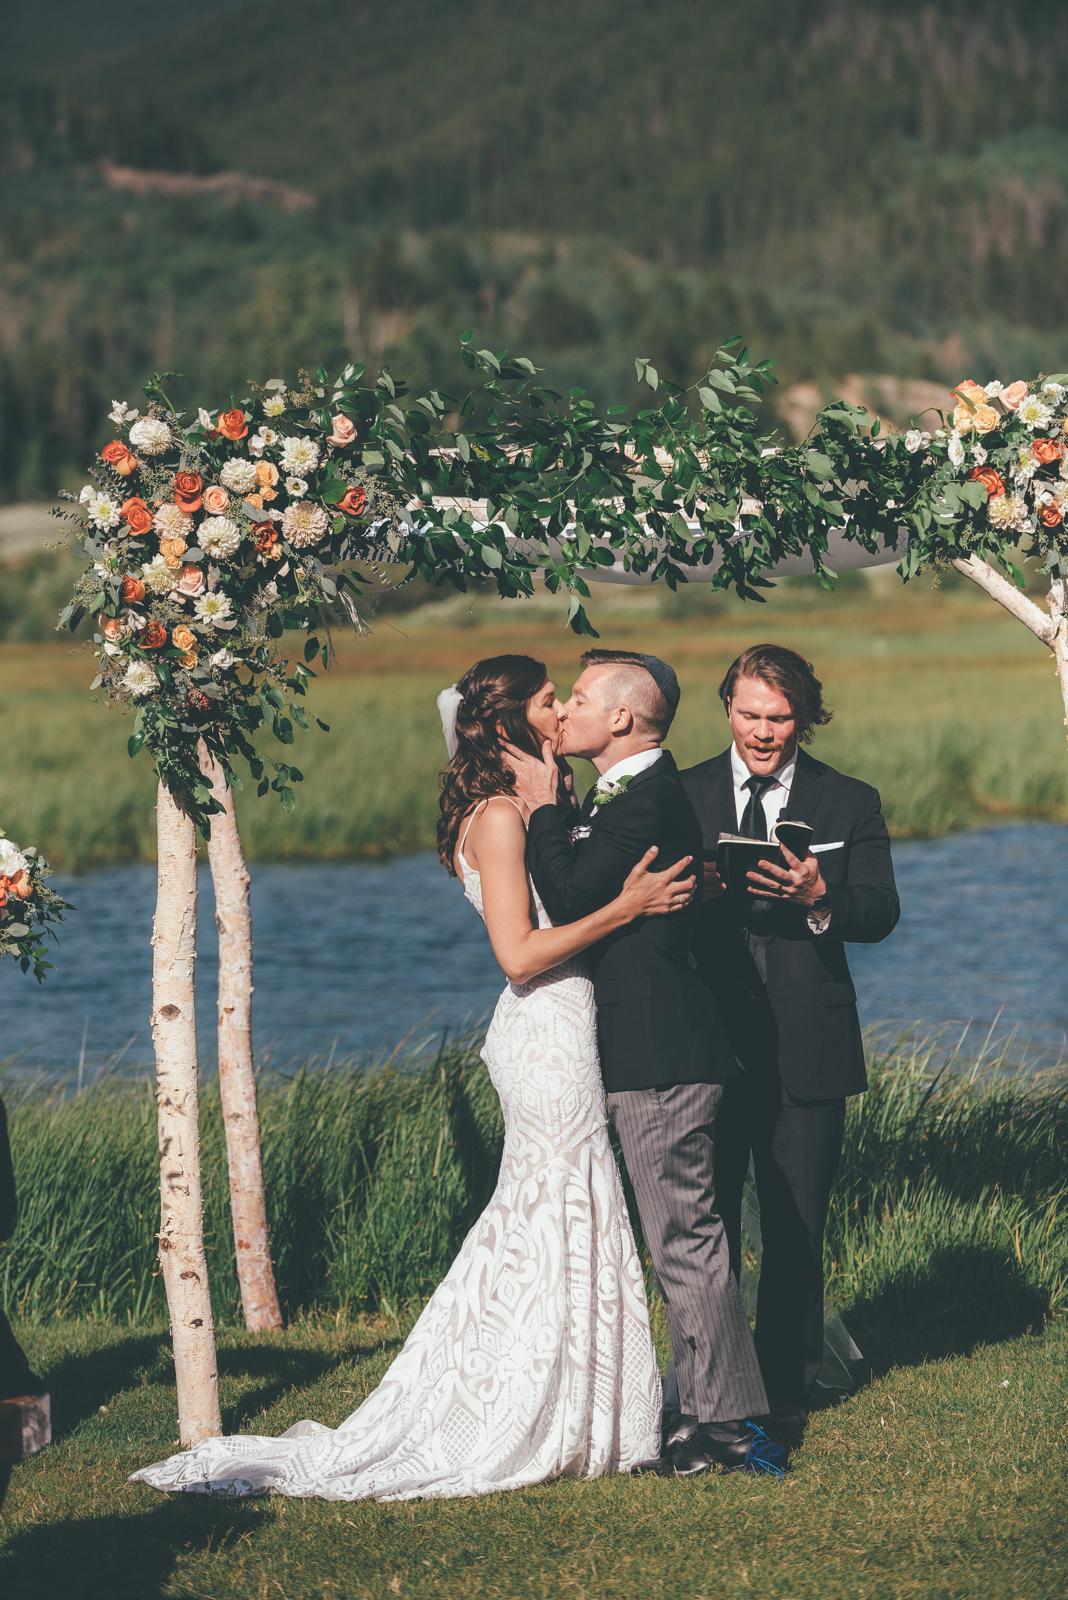 ChadFahnestockPhotography-honeymoon-016.jpg